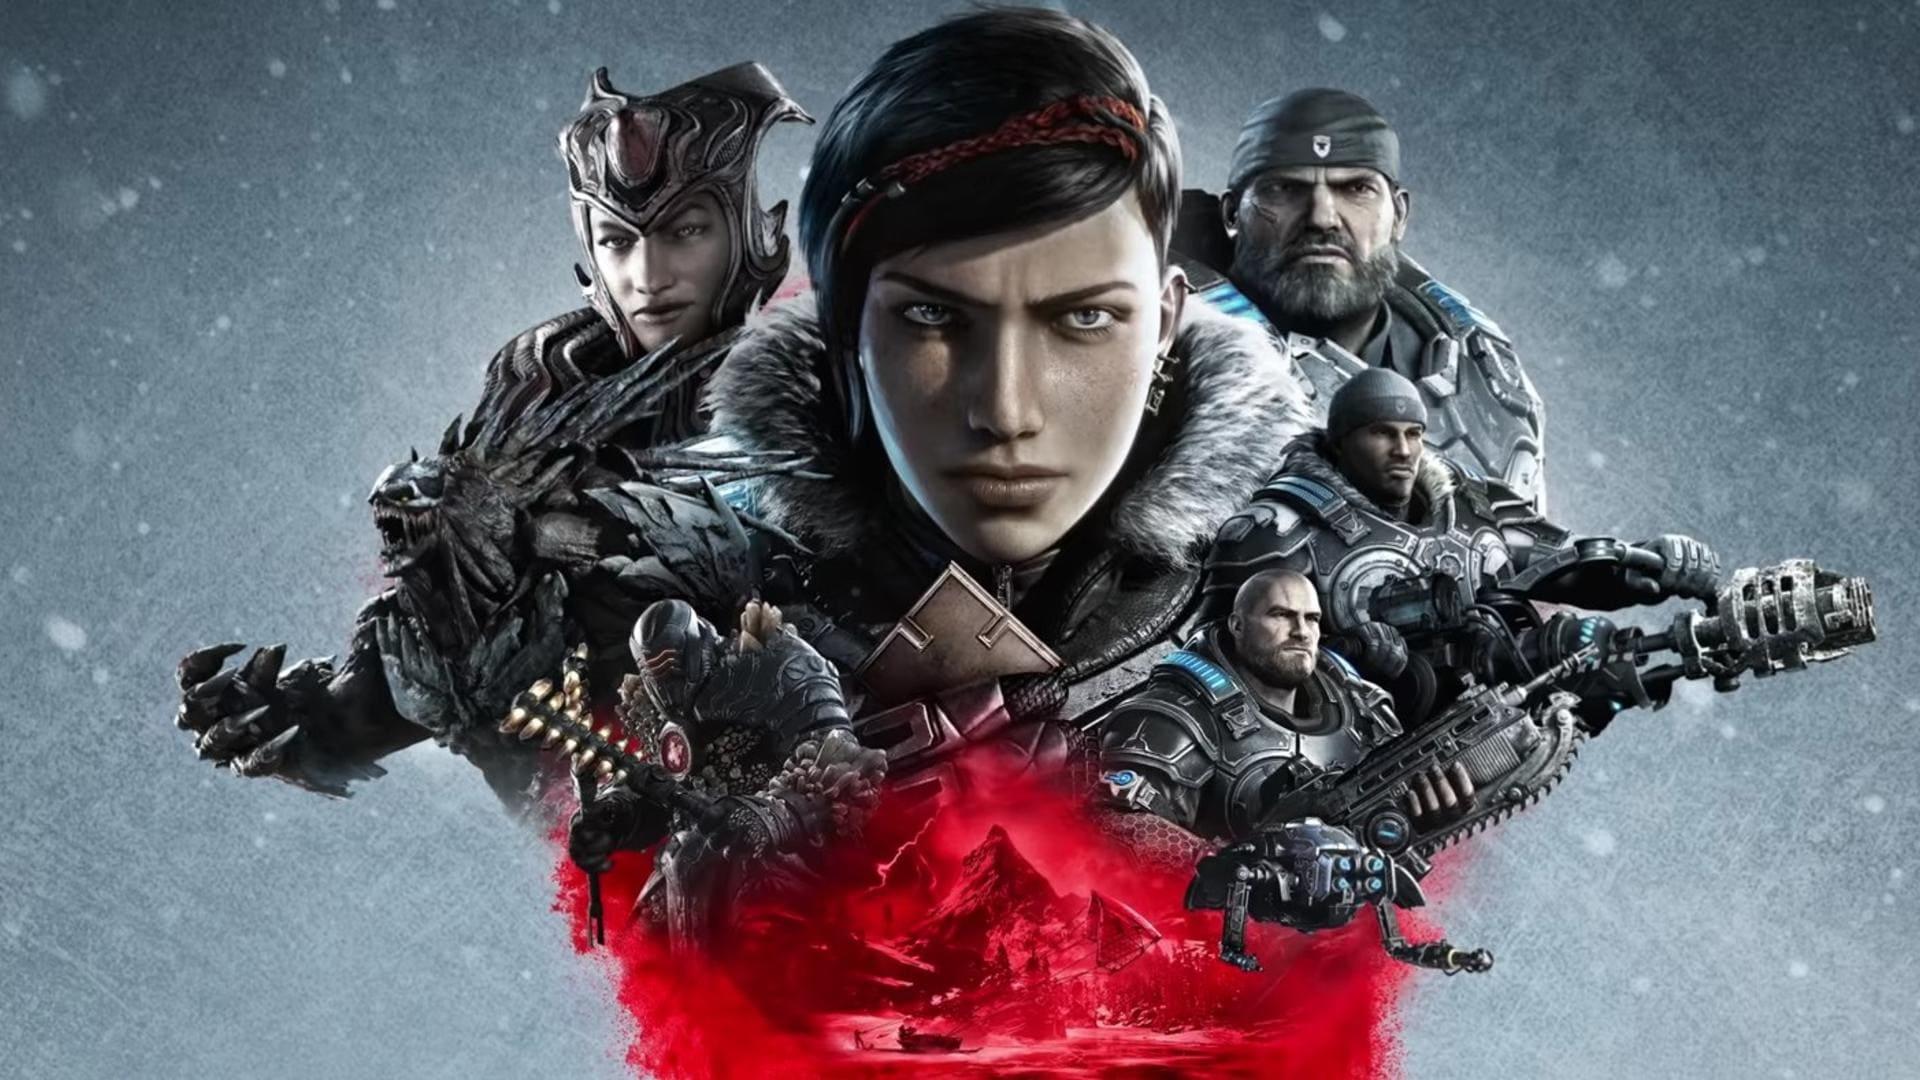 gears of war 5 review 2